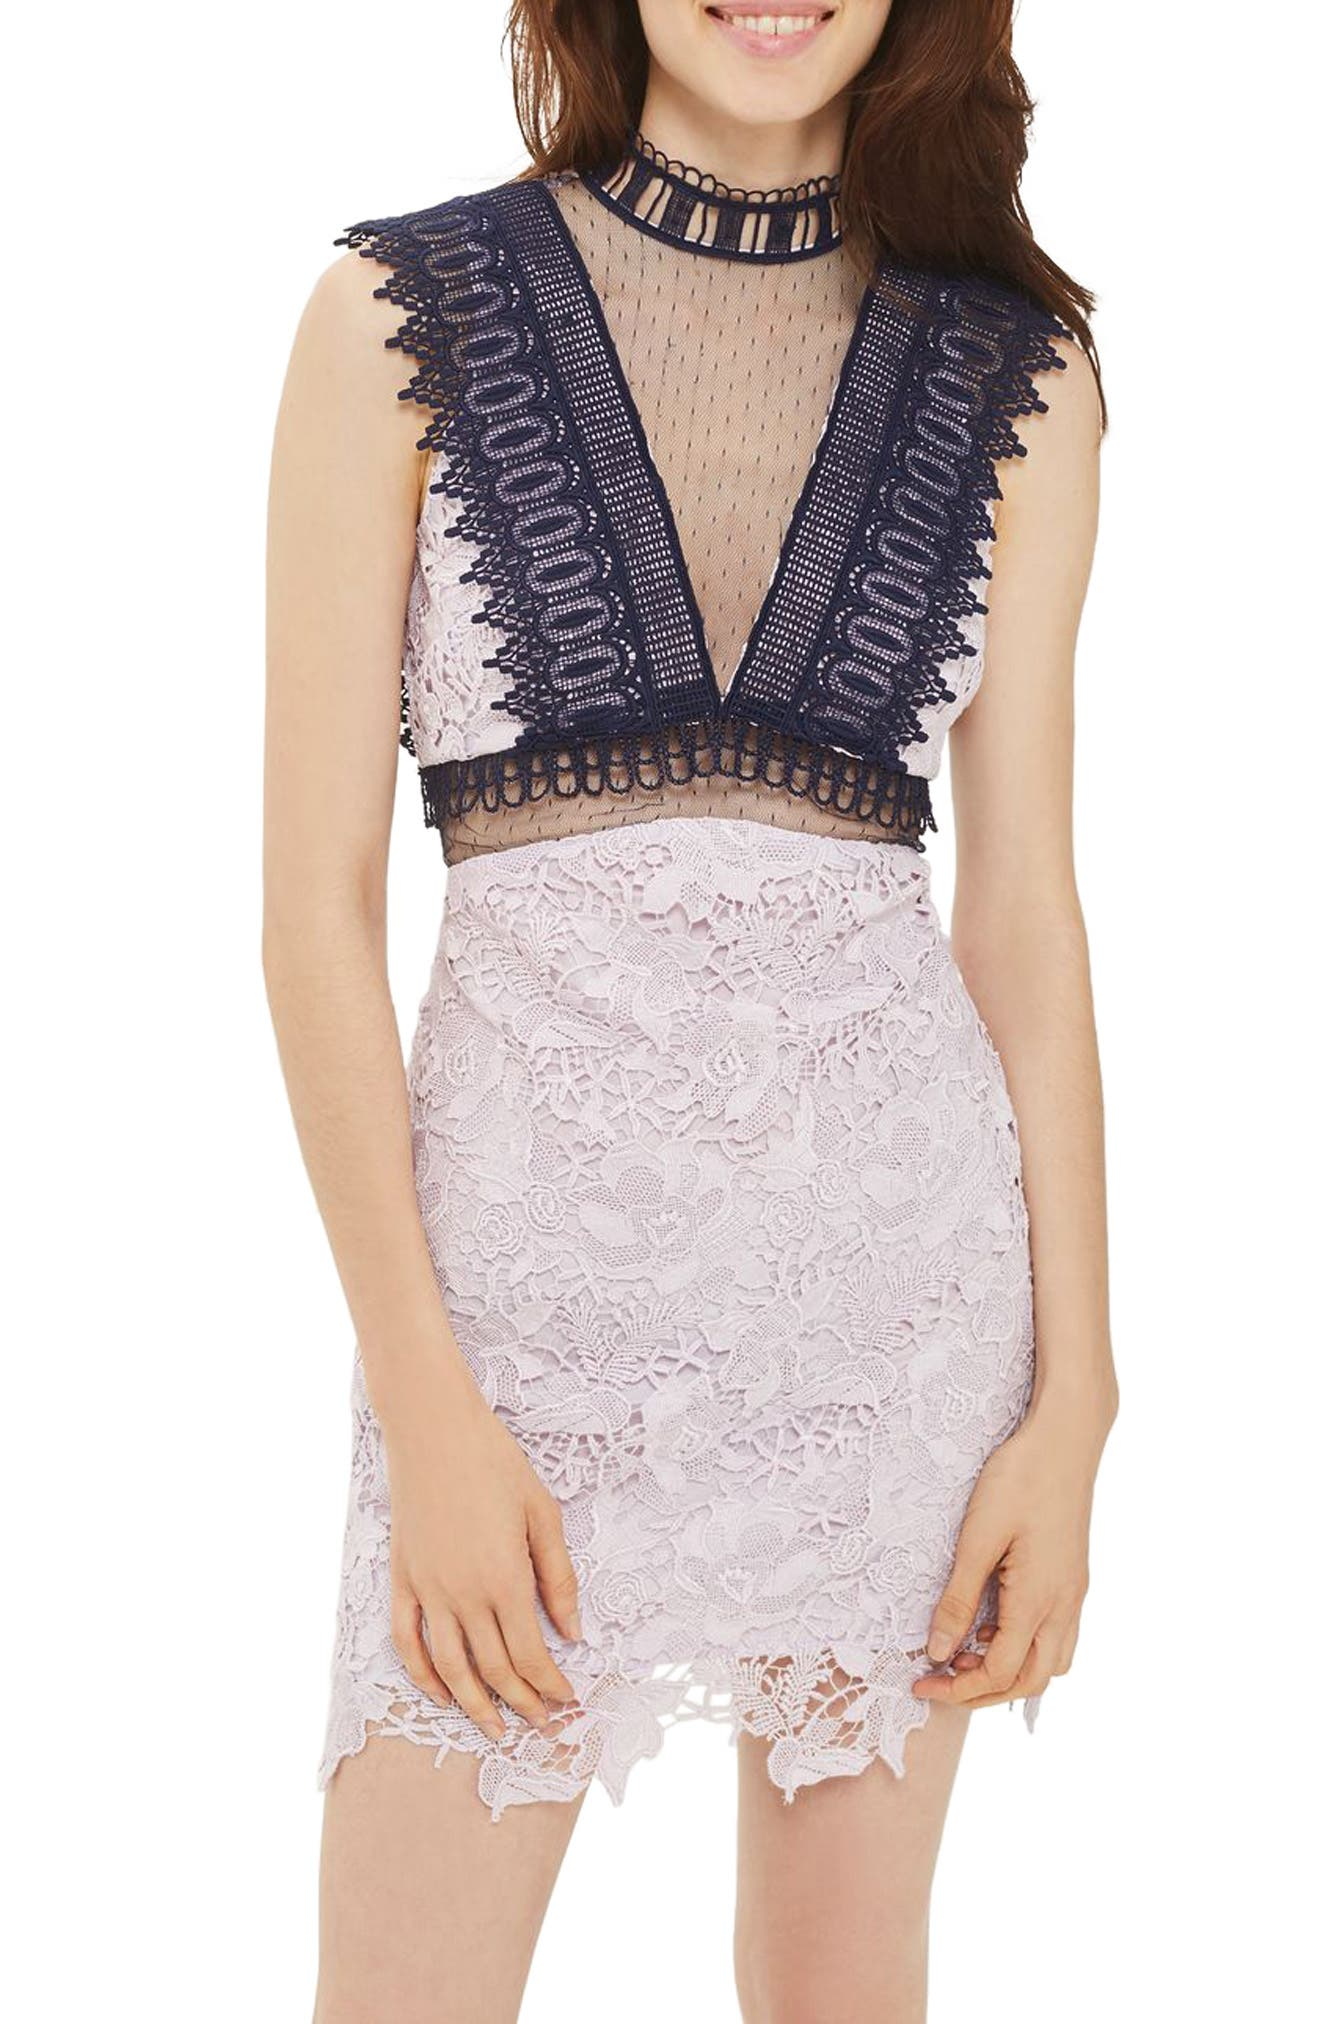 Topshop Contrast & Illusion Lace Minidress